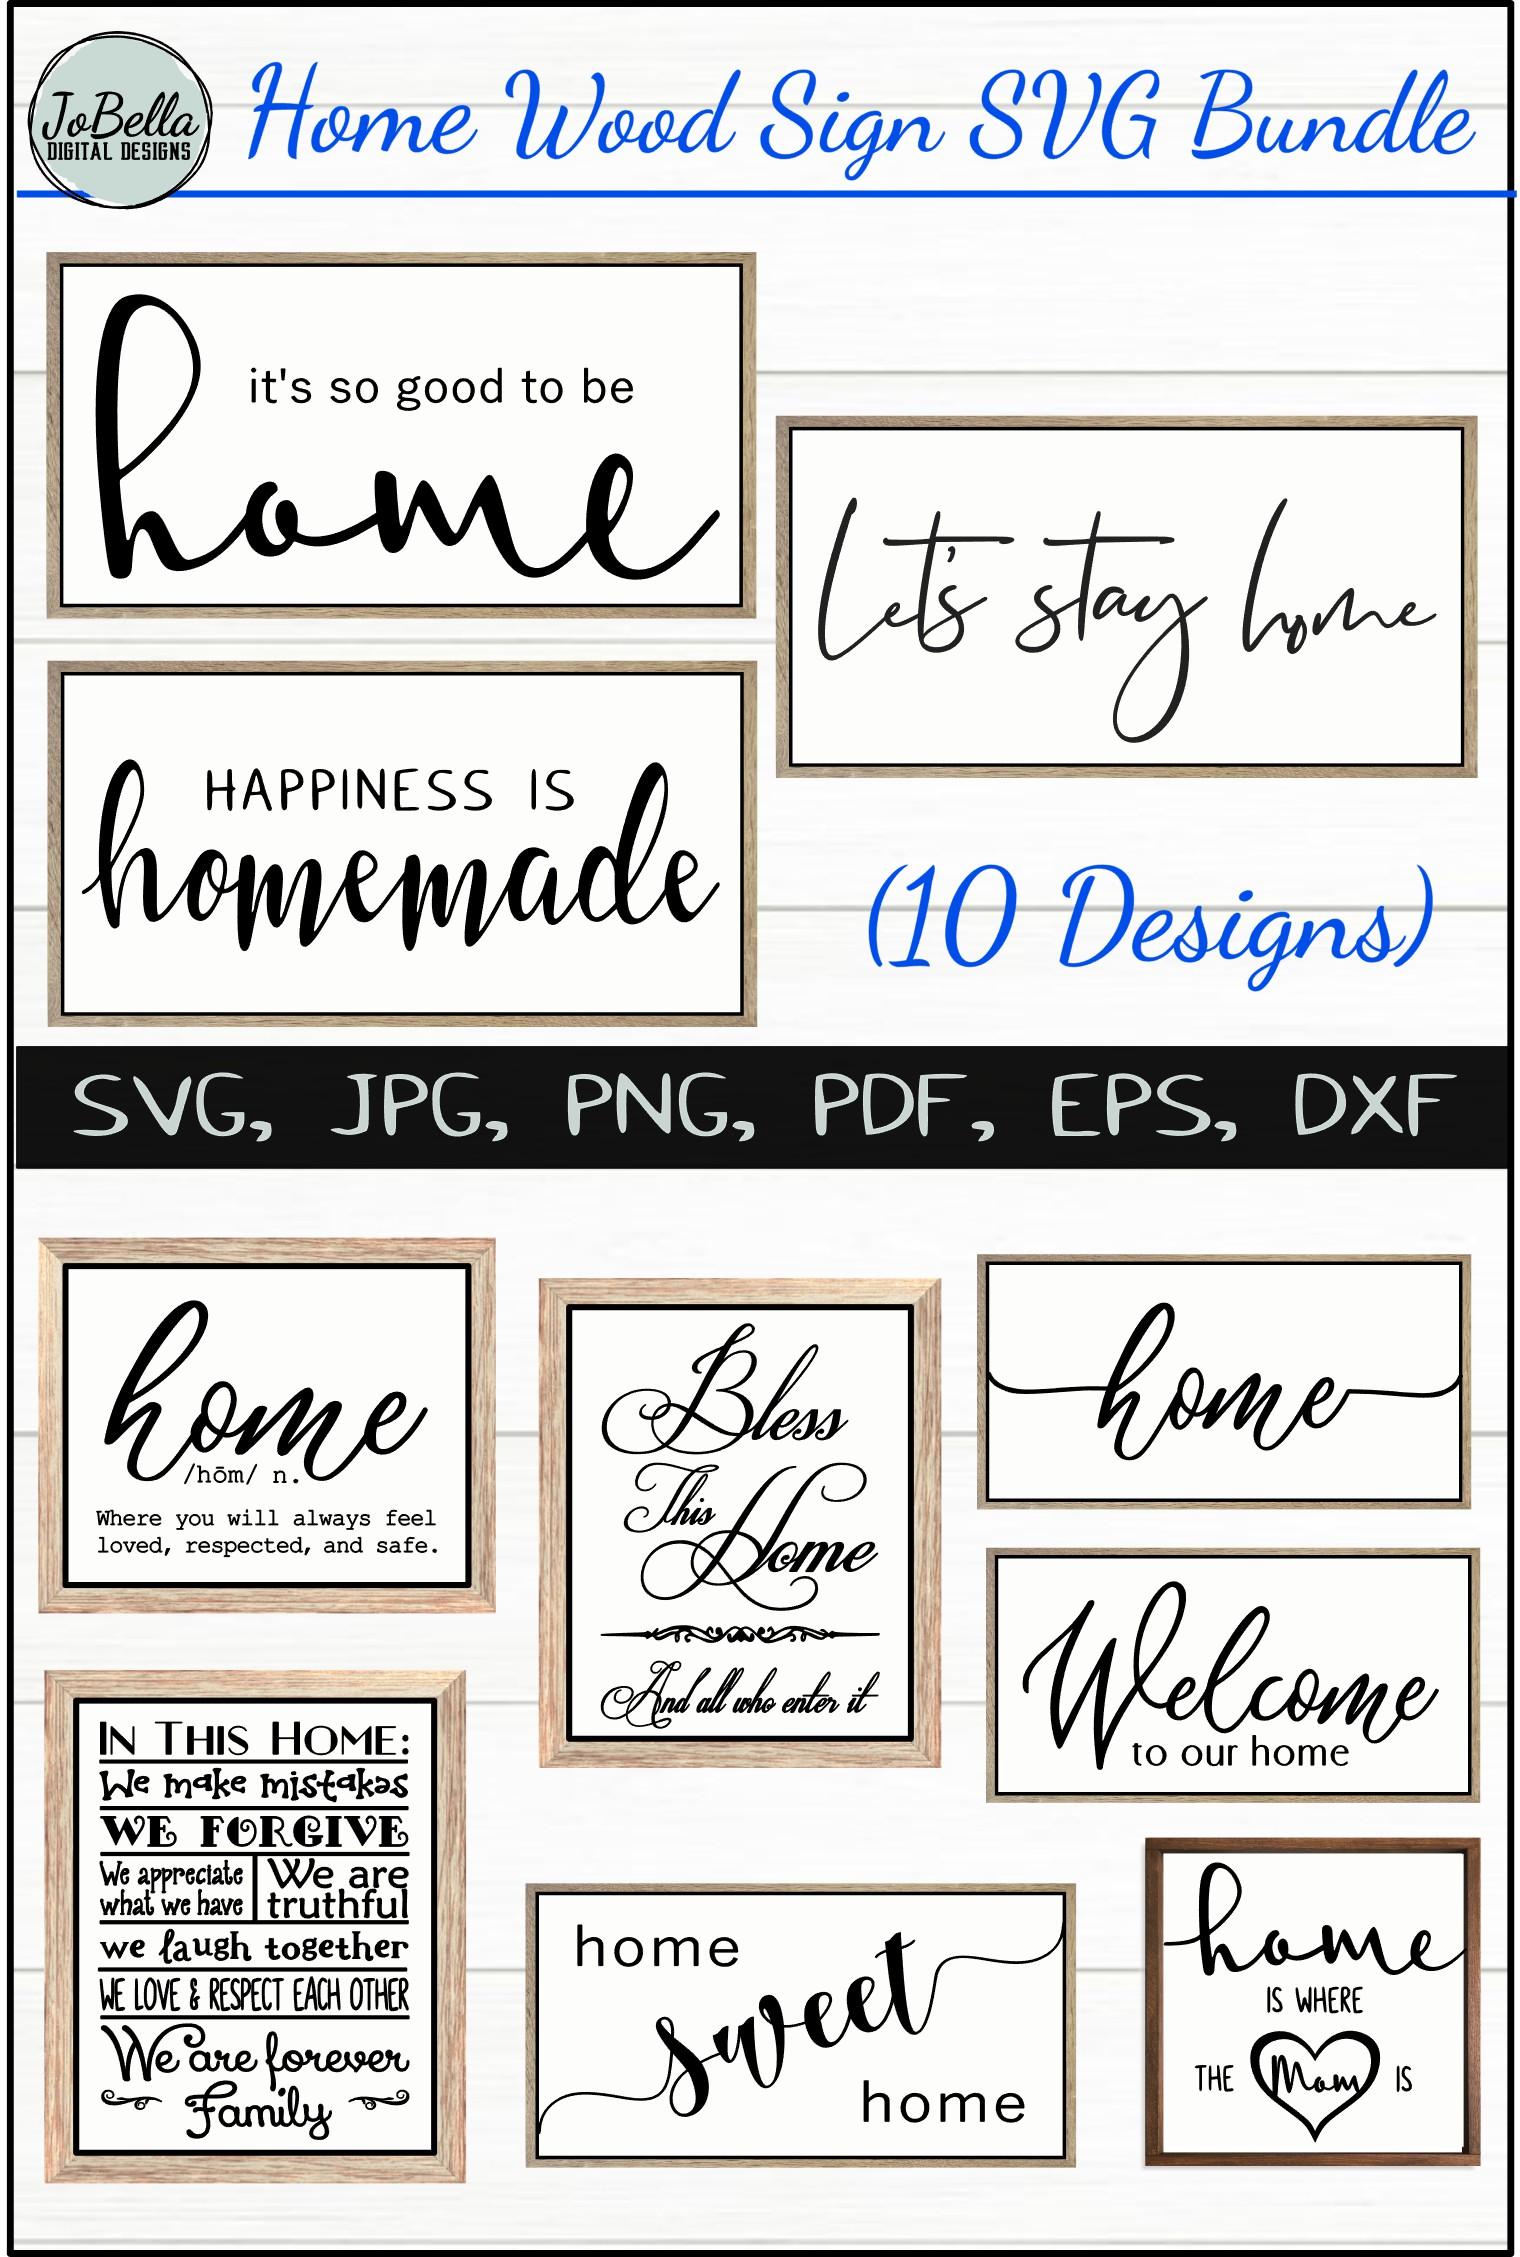 Home Wood Sign SVG Bundle - Farmhouse SVG Bundle example image 12